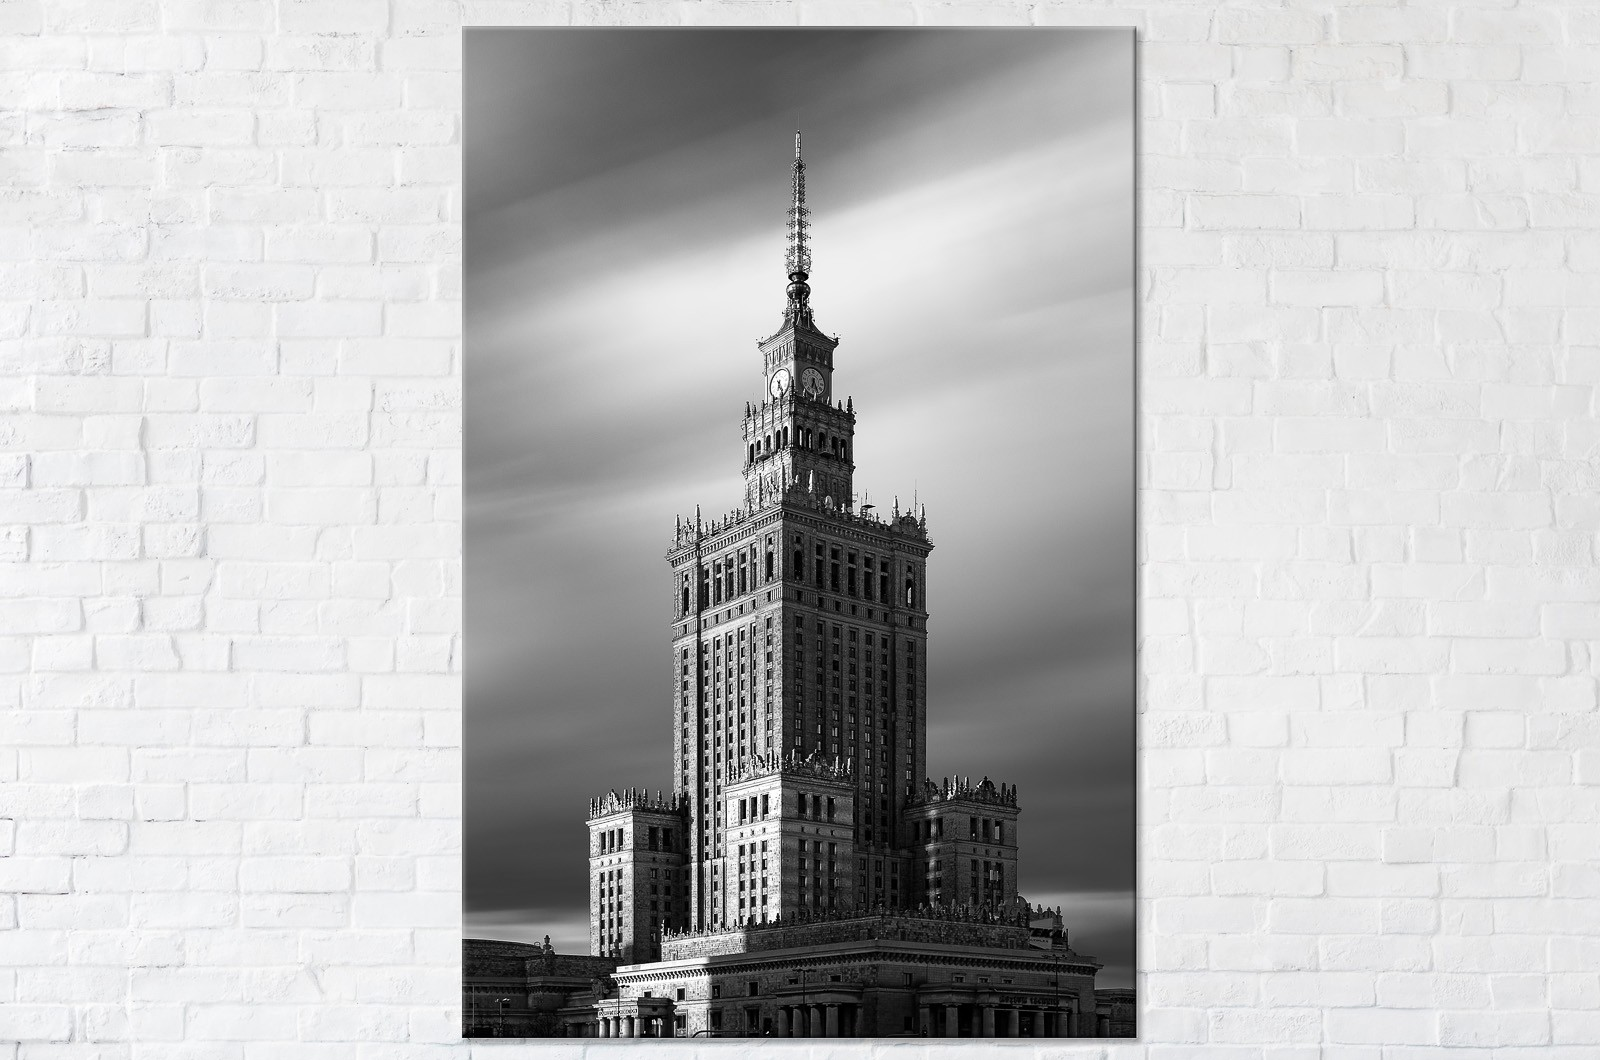 Monumentalny Pałac Kultury i Nauki BW Fotooobraz